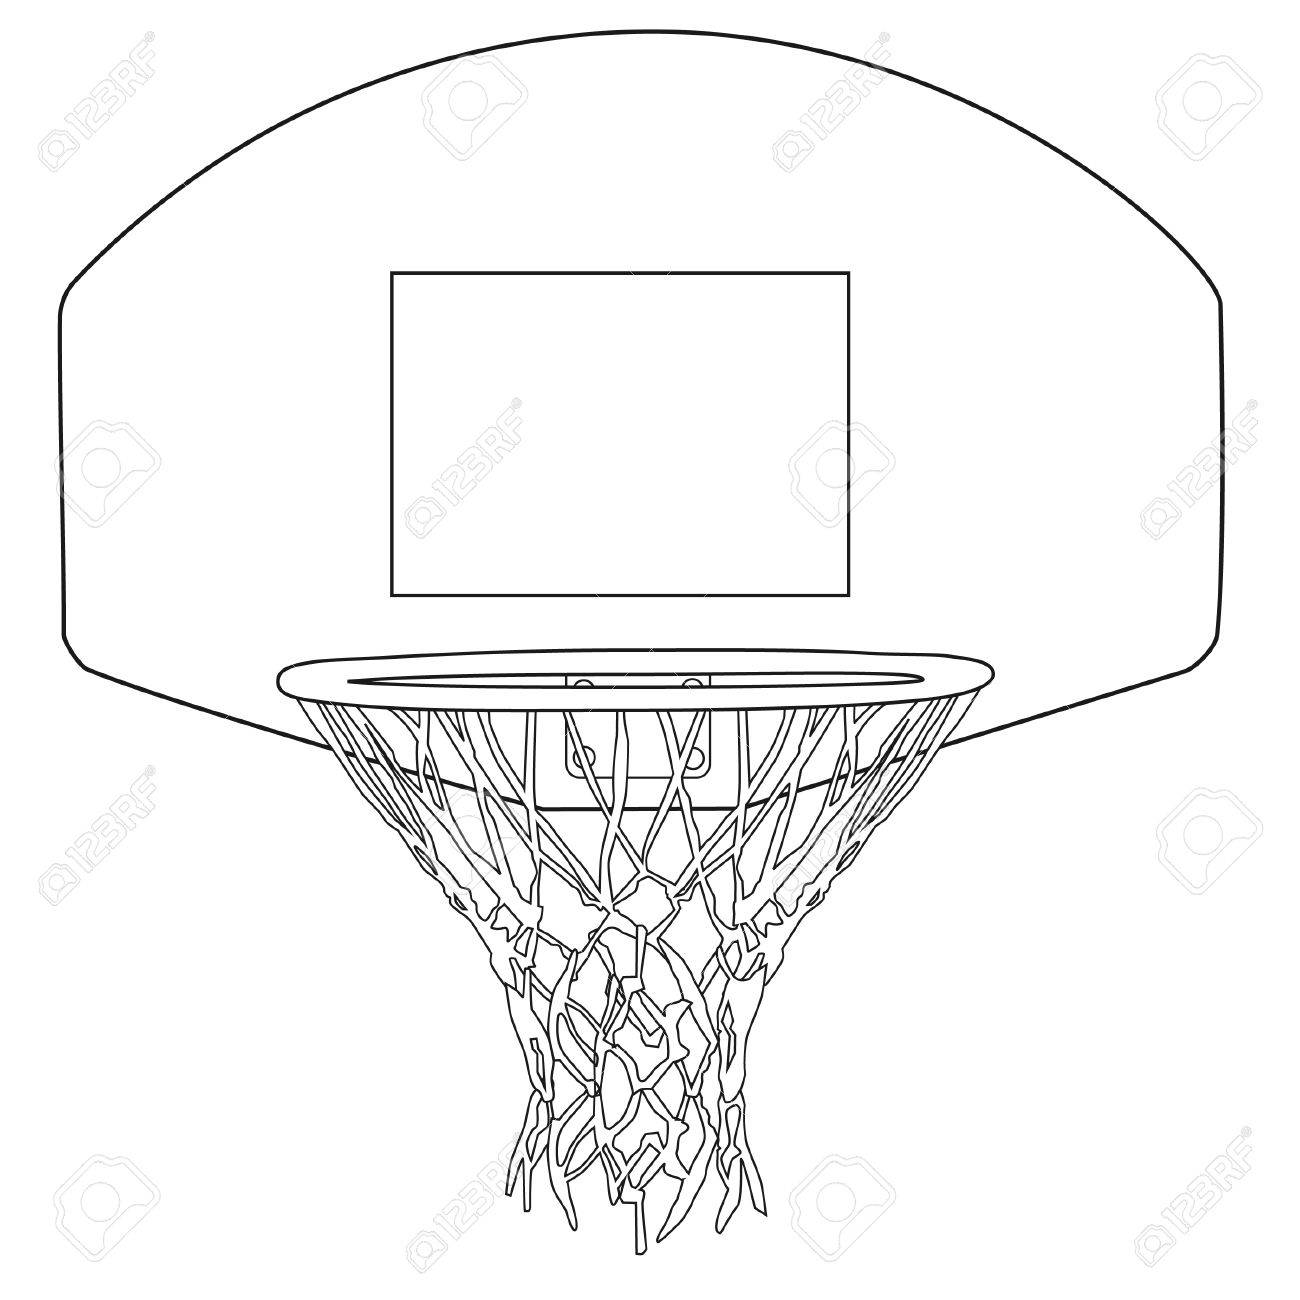 Basketball Backboard Drawing At Getdrawings